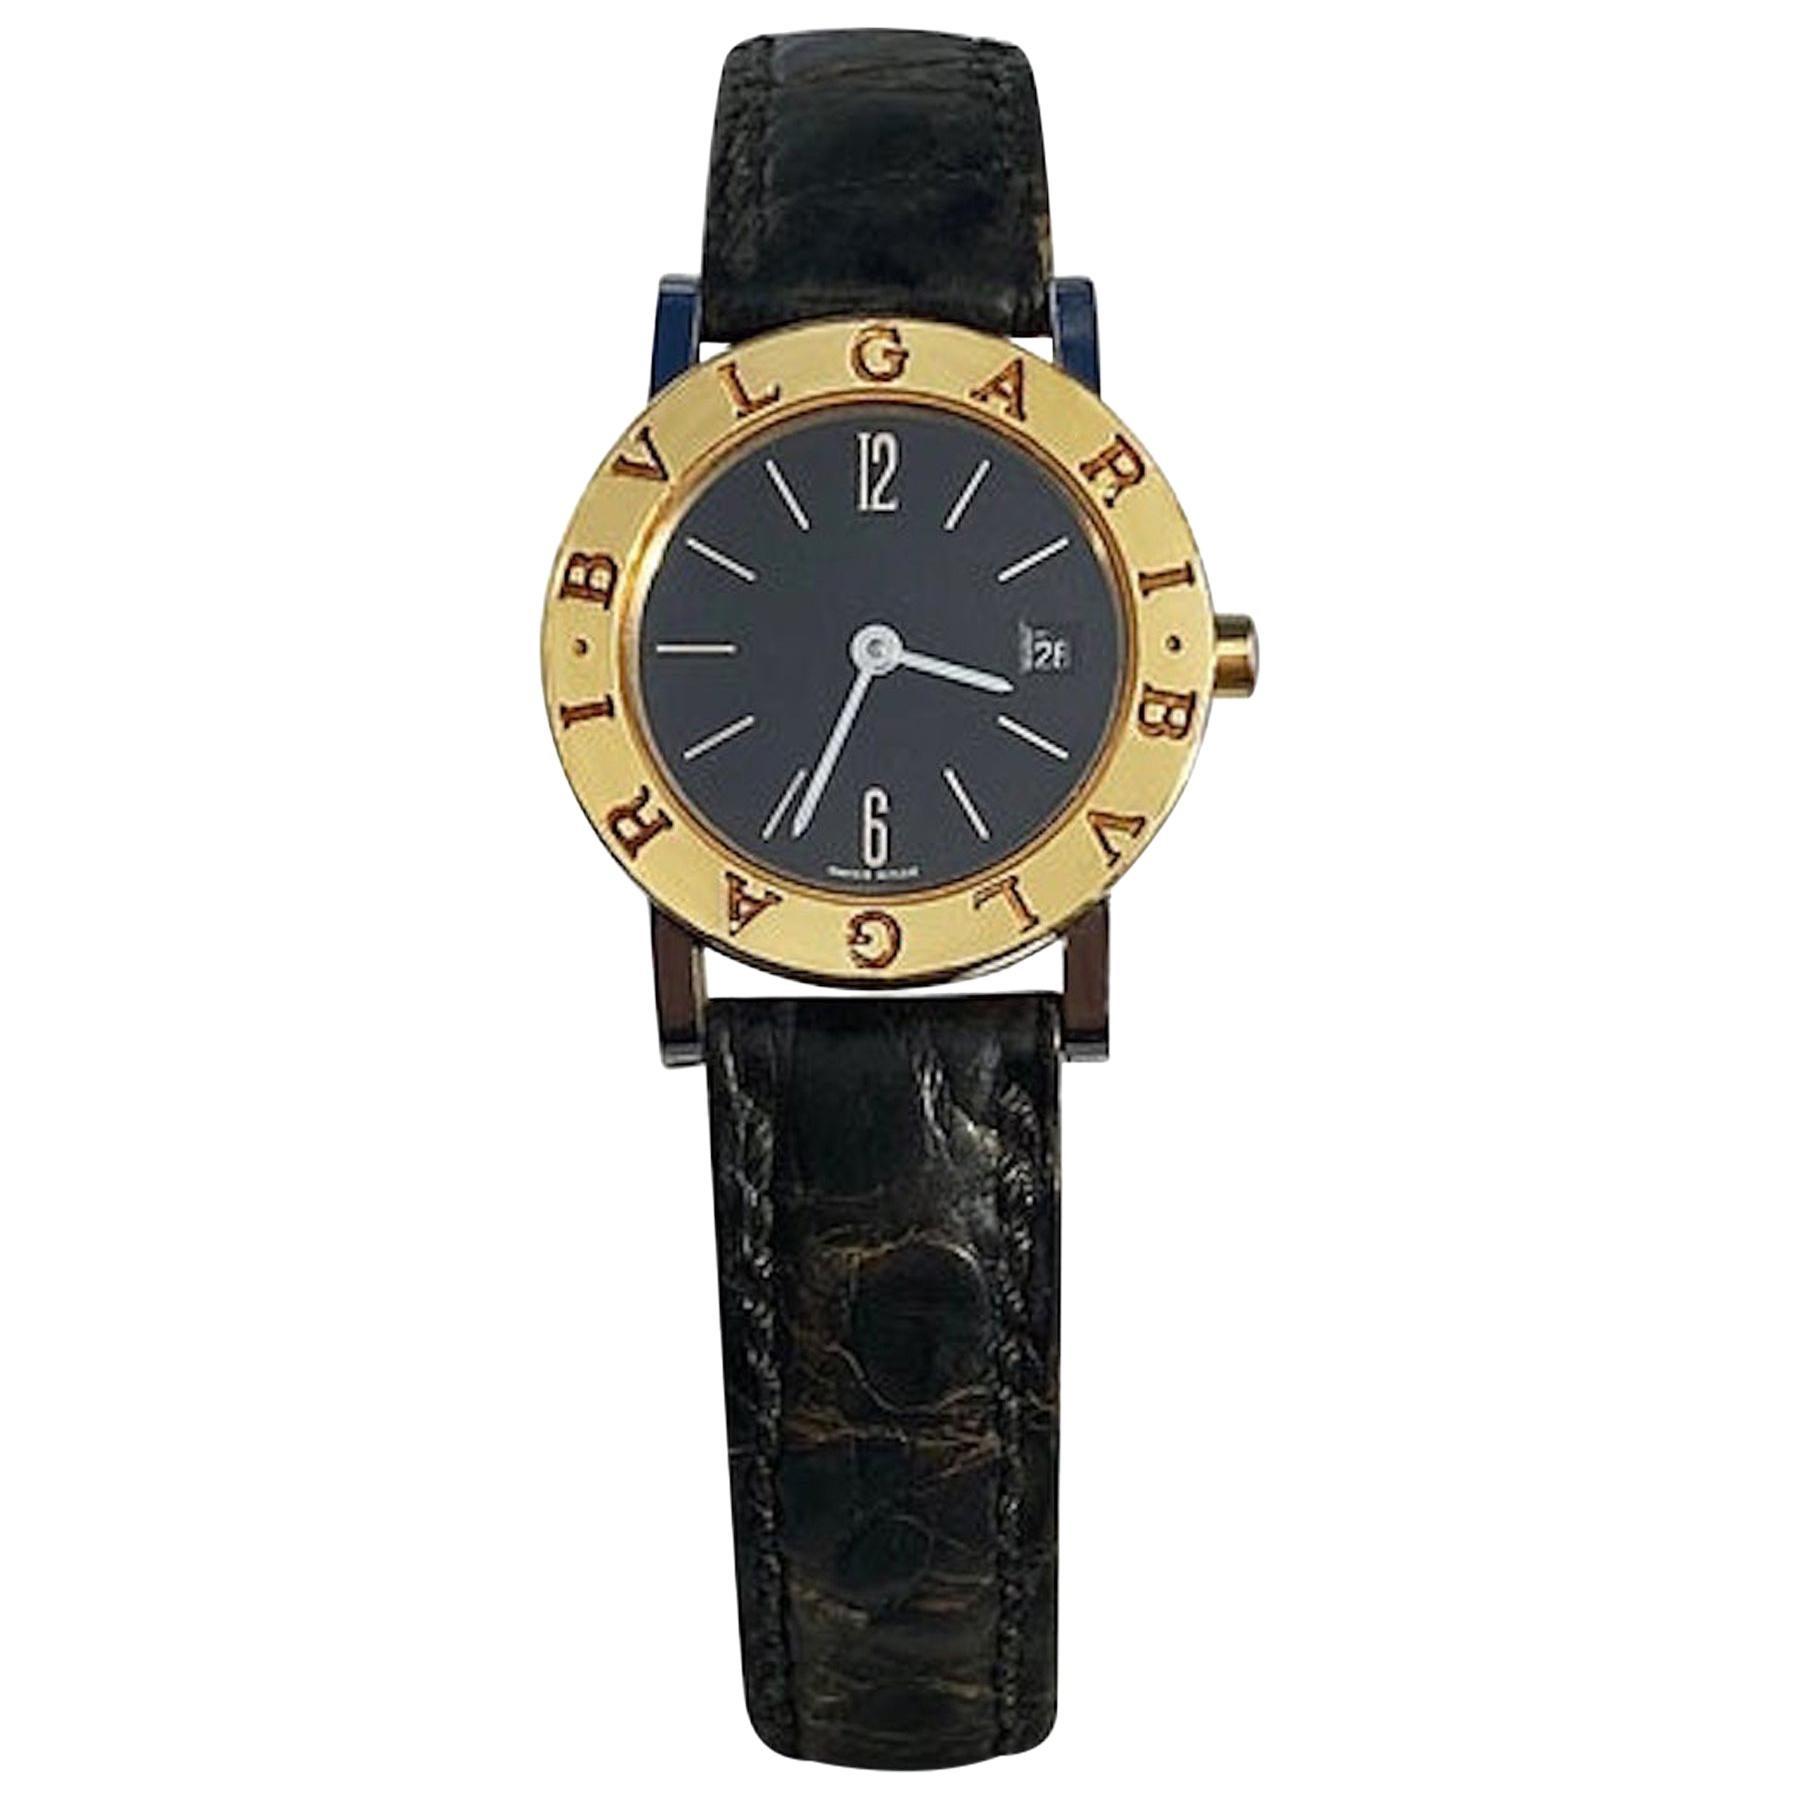 Bvlgari BB26 SLG Gold Dial Black Leather Strap Watch Unisex Bvlgari Wristwatch